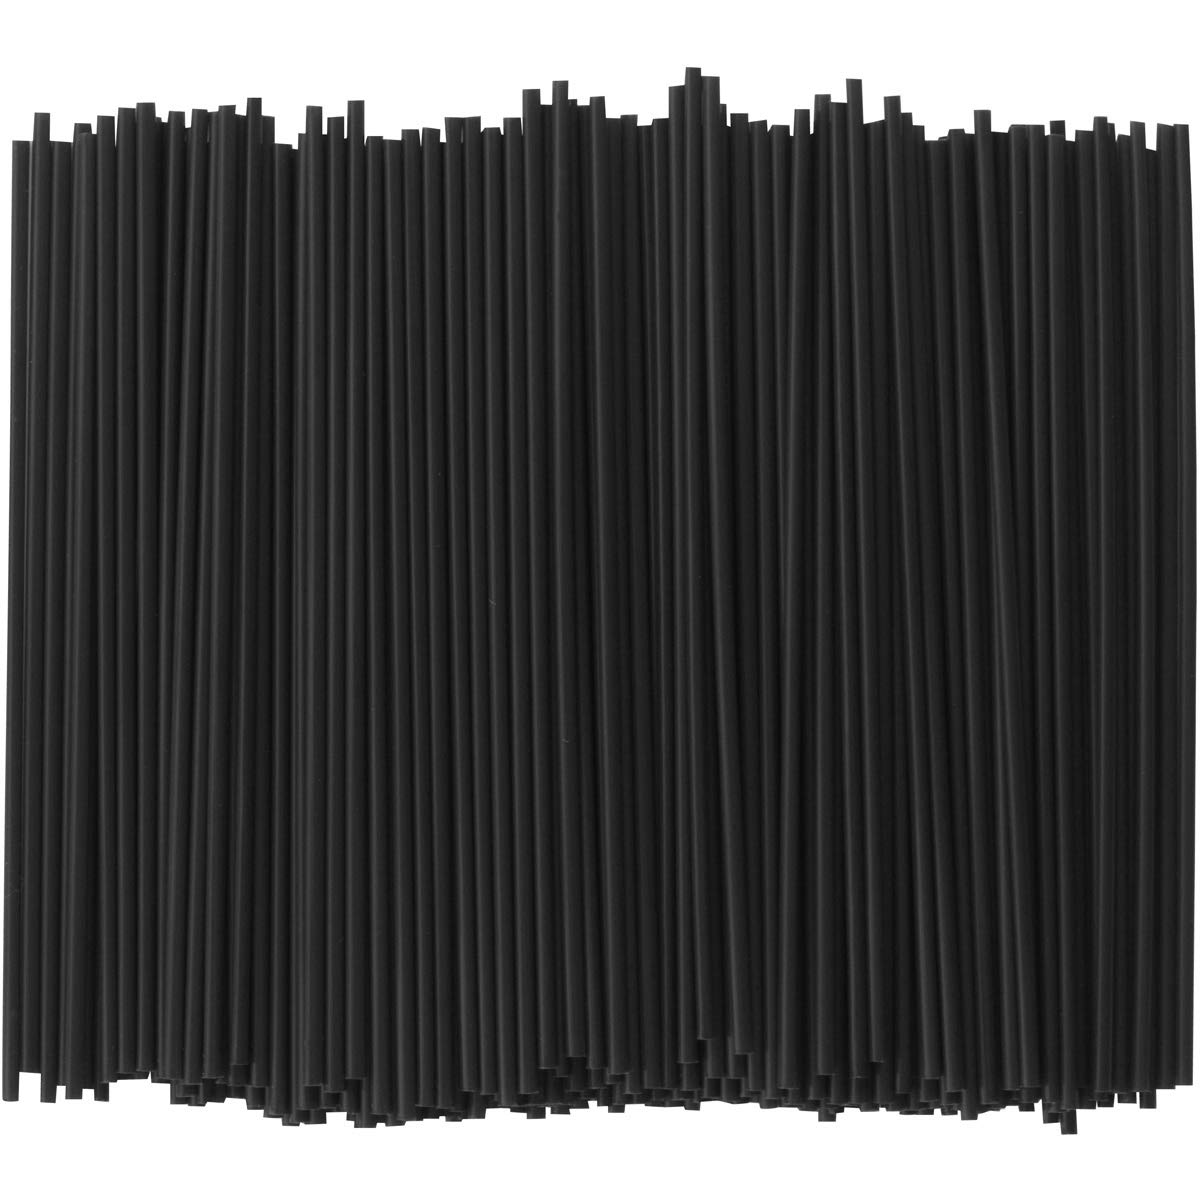 Coffee Stir Sticks, Plastic Stirrers: USA Made, BPA Free: Cocktail Straws, 5.25'' Black, 1000ct by Alexius (Image #2)